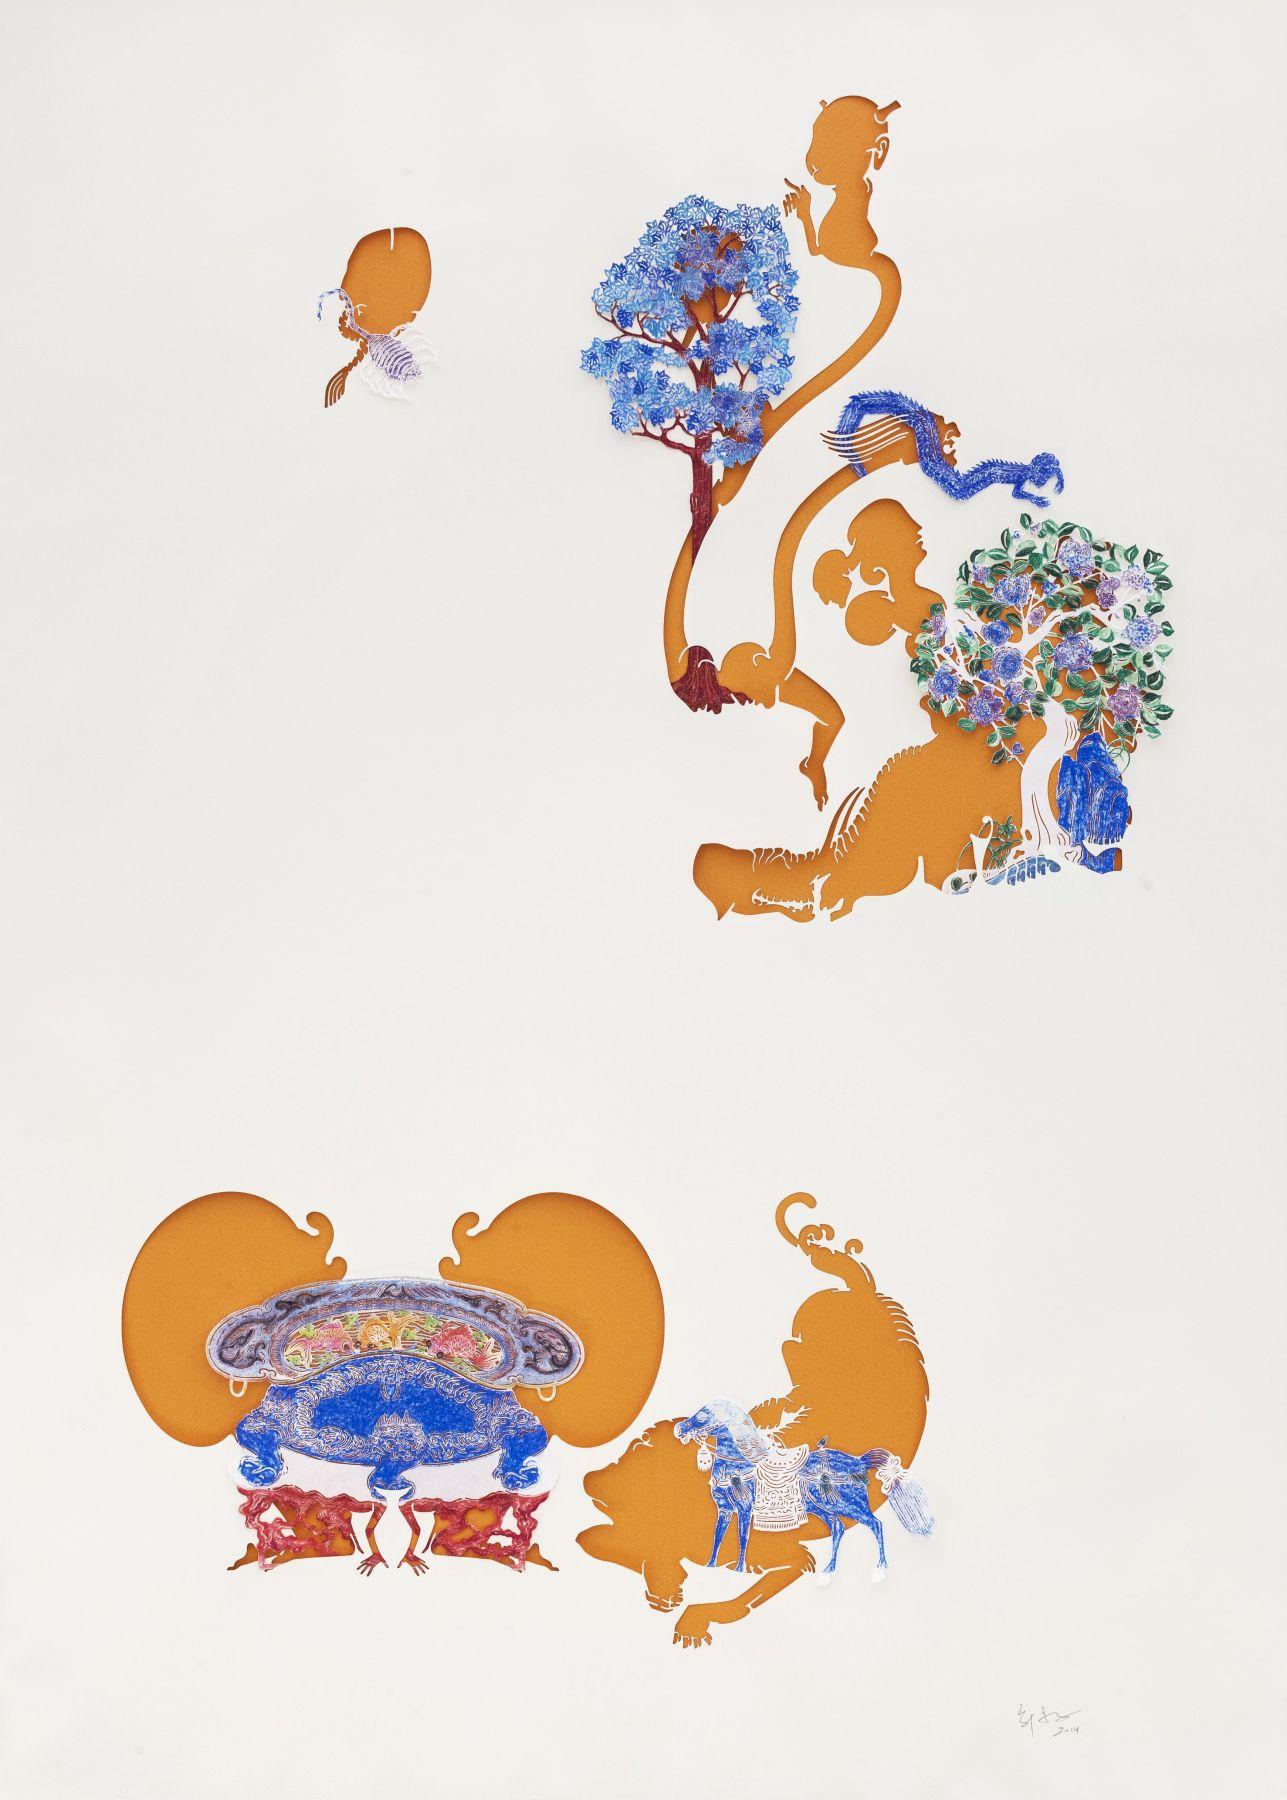 "Wu Jian'ané'¬å»ºå®‰(b. 1980), Orange-Red Gardenæ©™çº¢è‰²çš""花园, 2014"